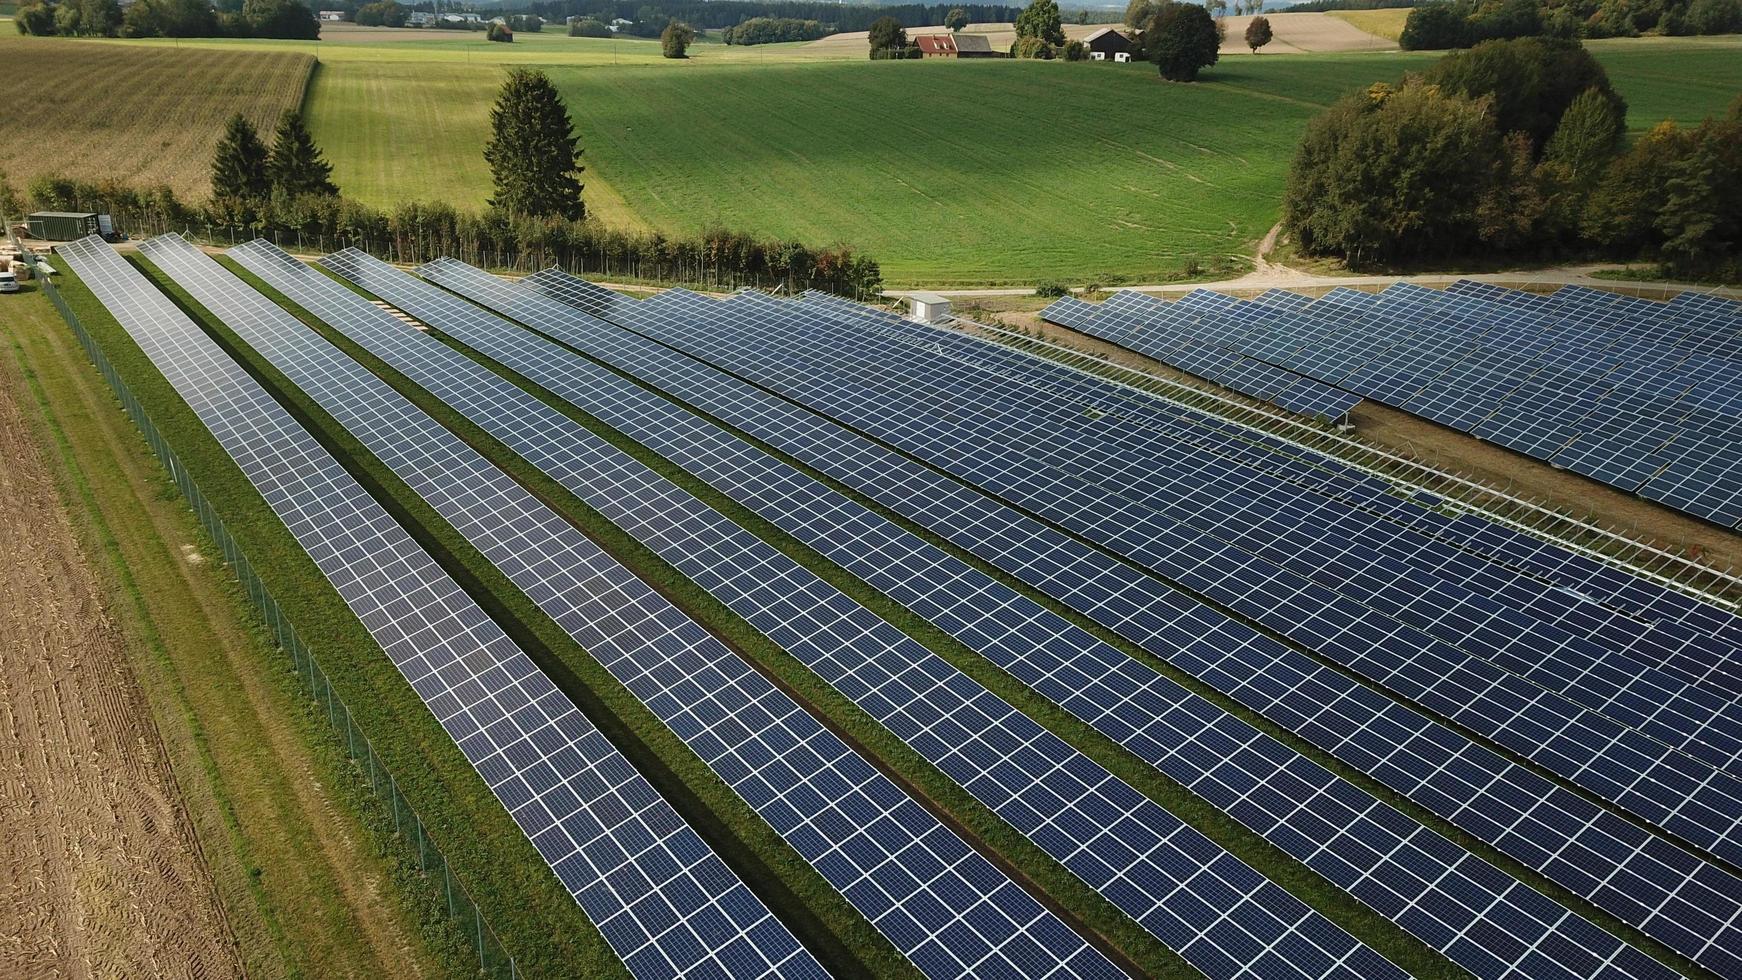 zonne-energie veld foto